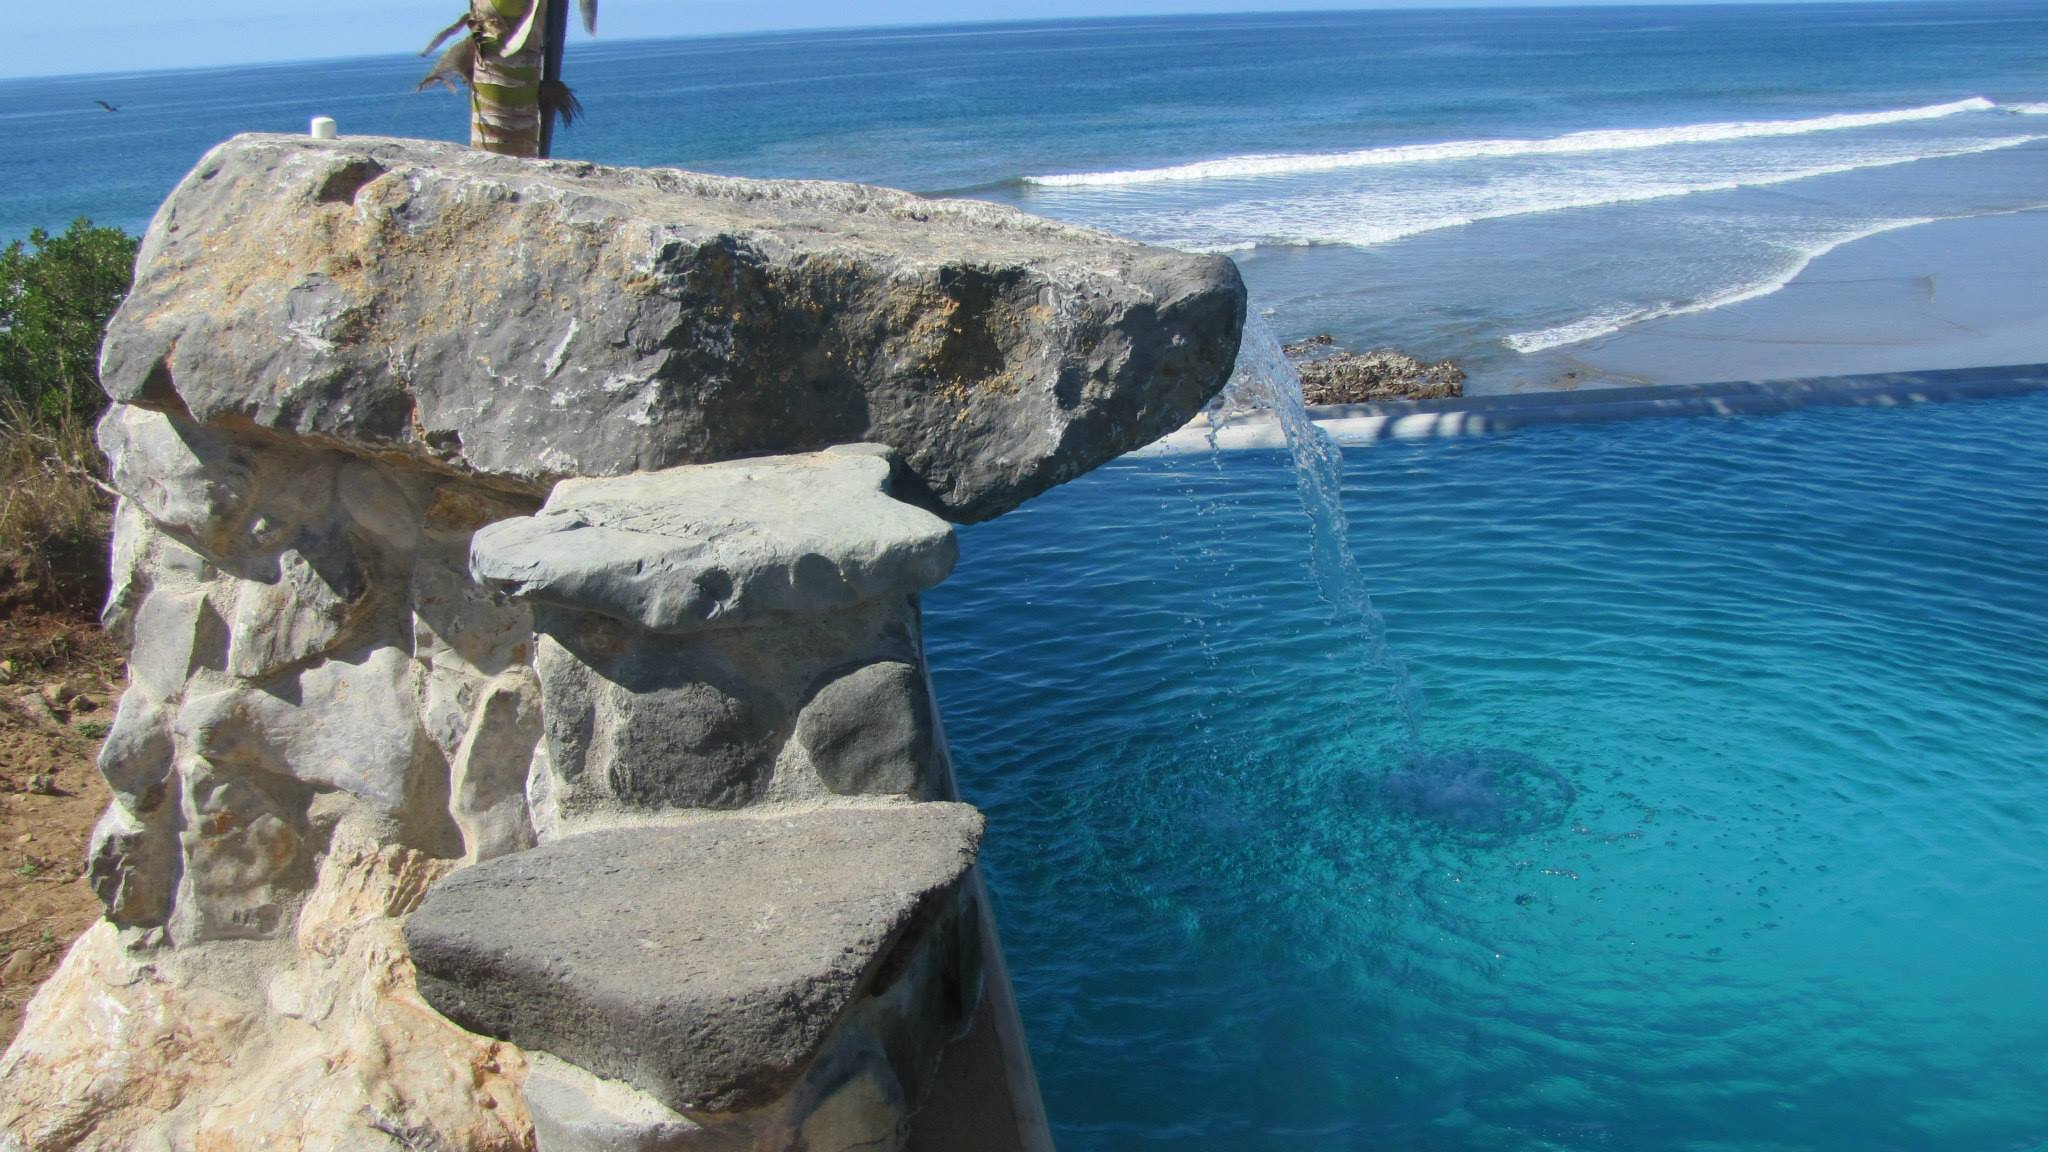 discover troncones saladita majahua mexico playa reservaciones hospedaje ixtapa guerrero travel near me booking hotel cheap hotel swimming pool beach